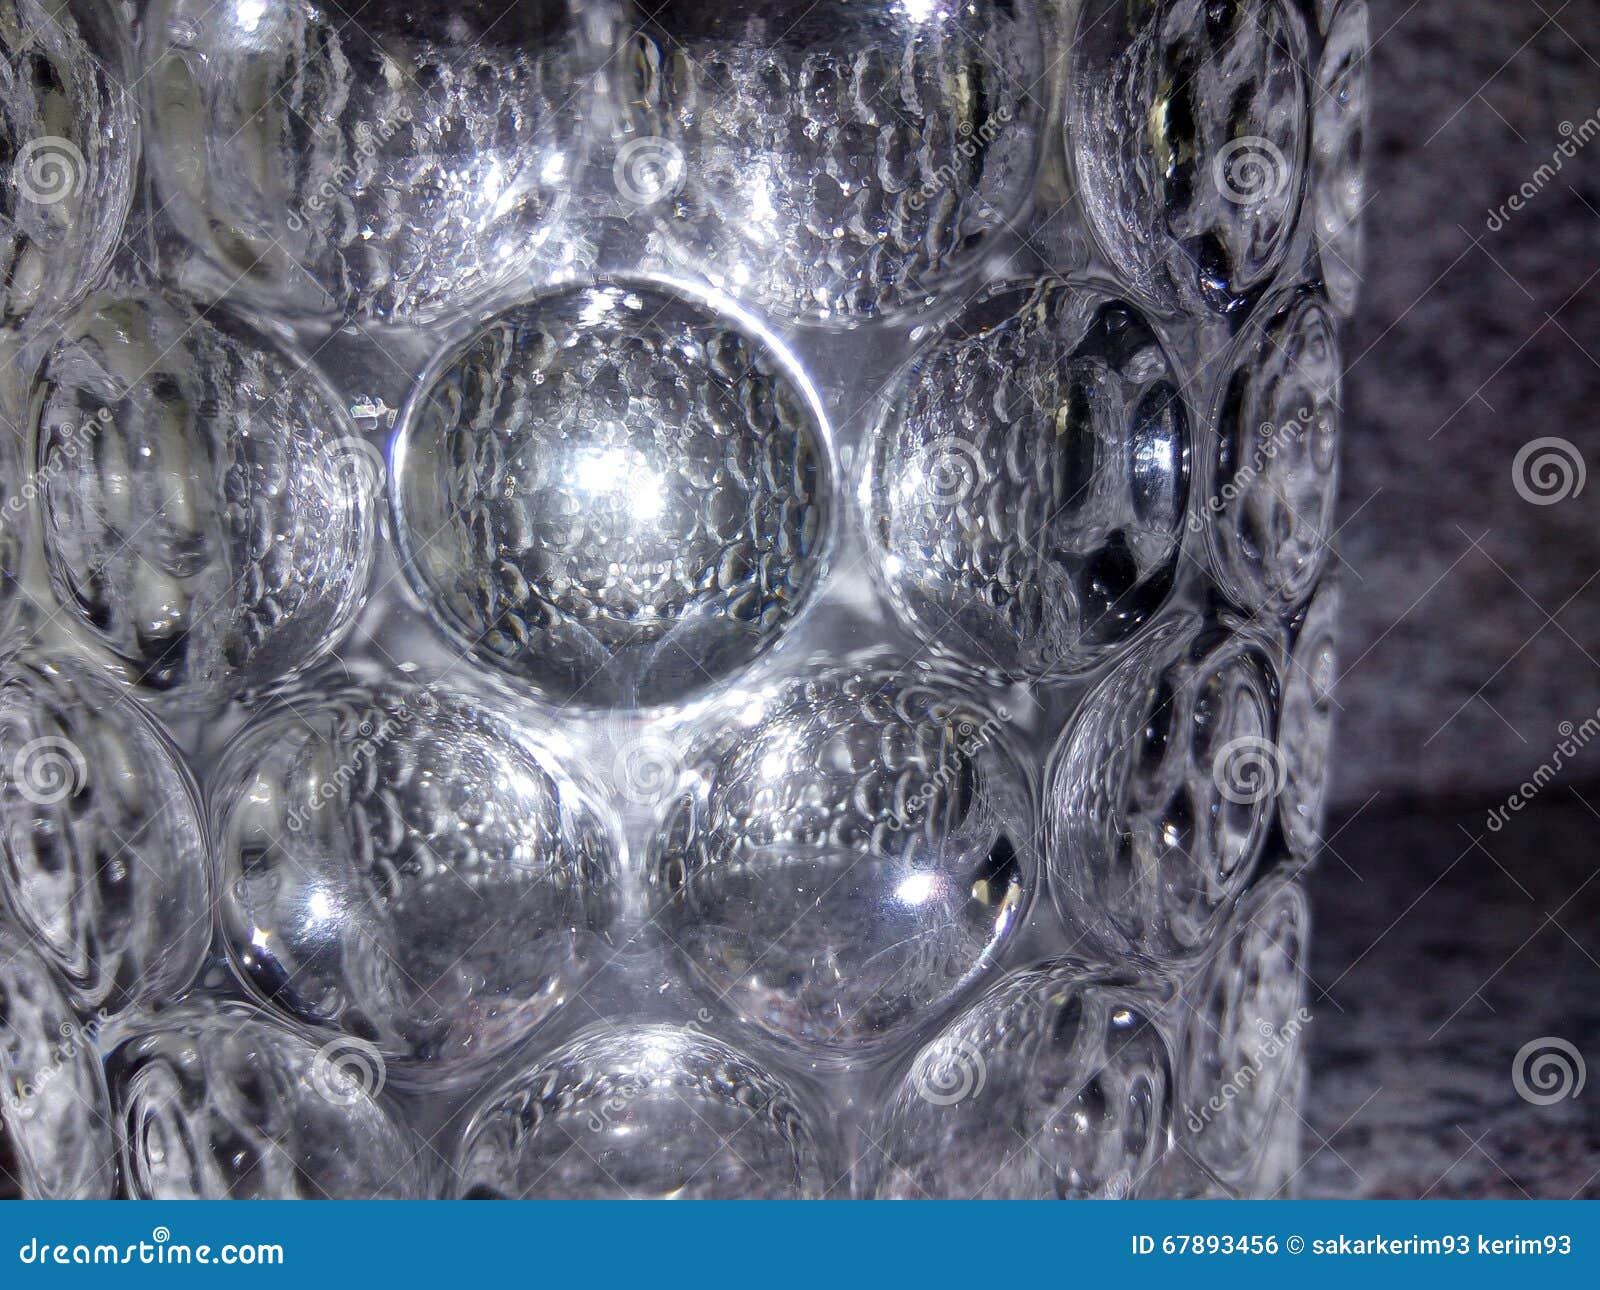 Claud kristal en verre